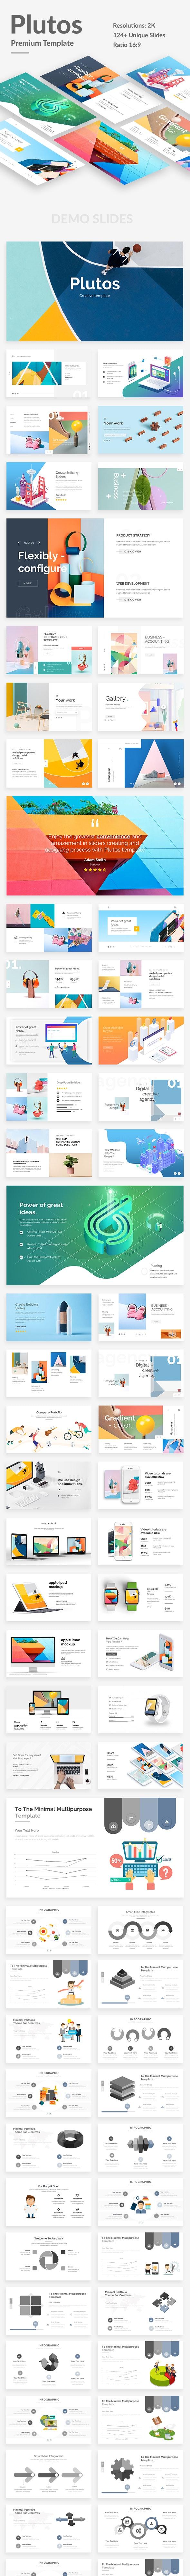 Plutos Premium Design Keynote Template - Creative Keynote Templates